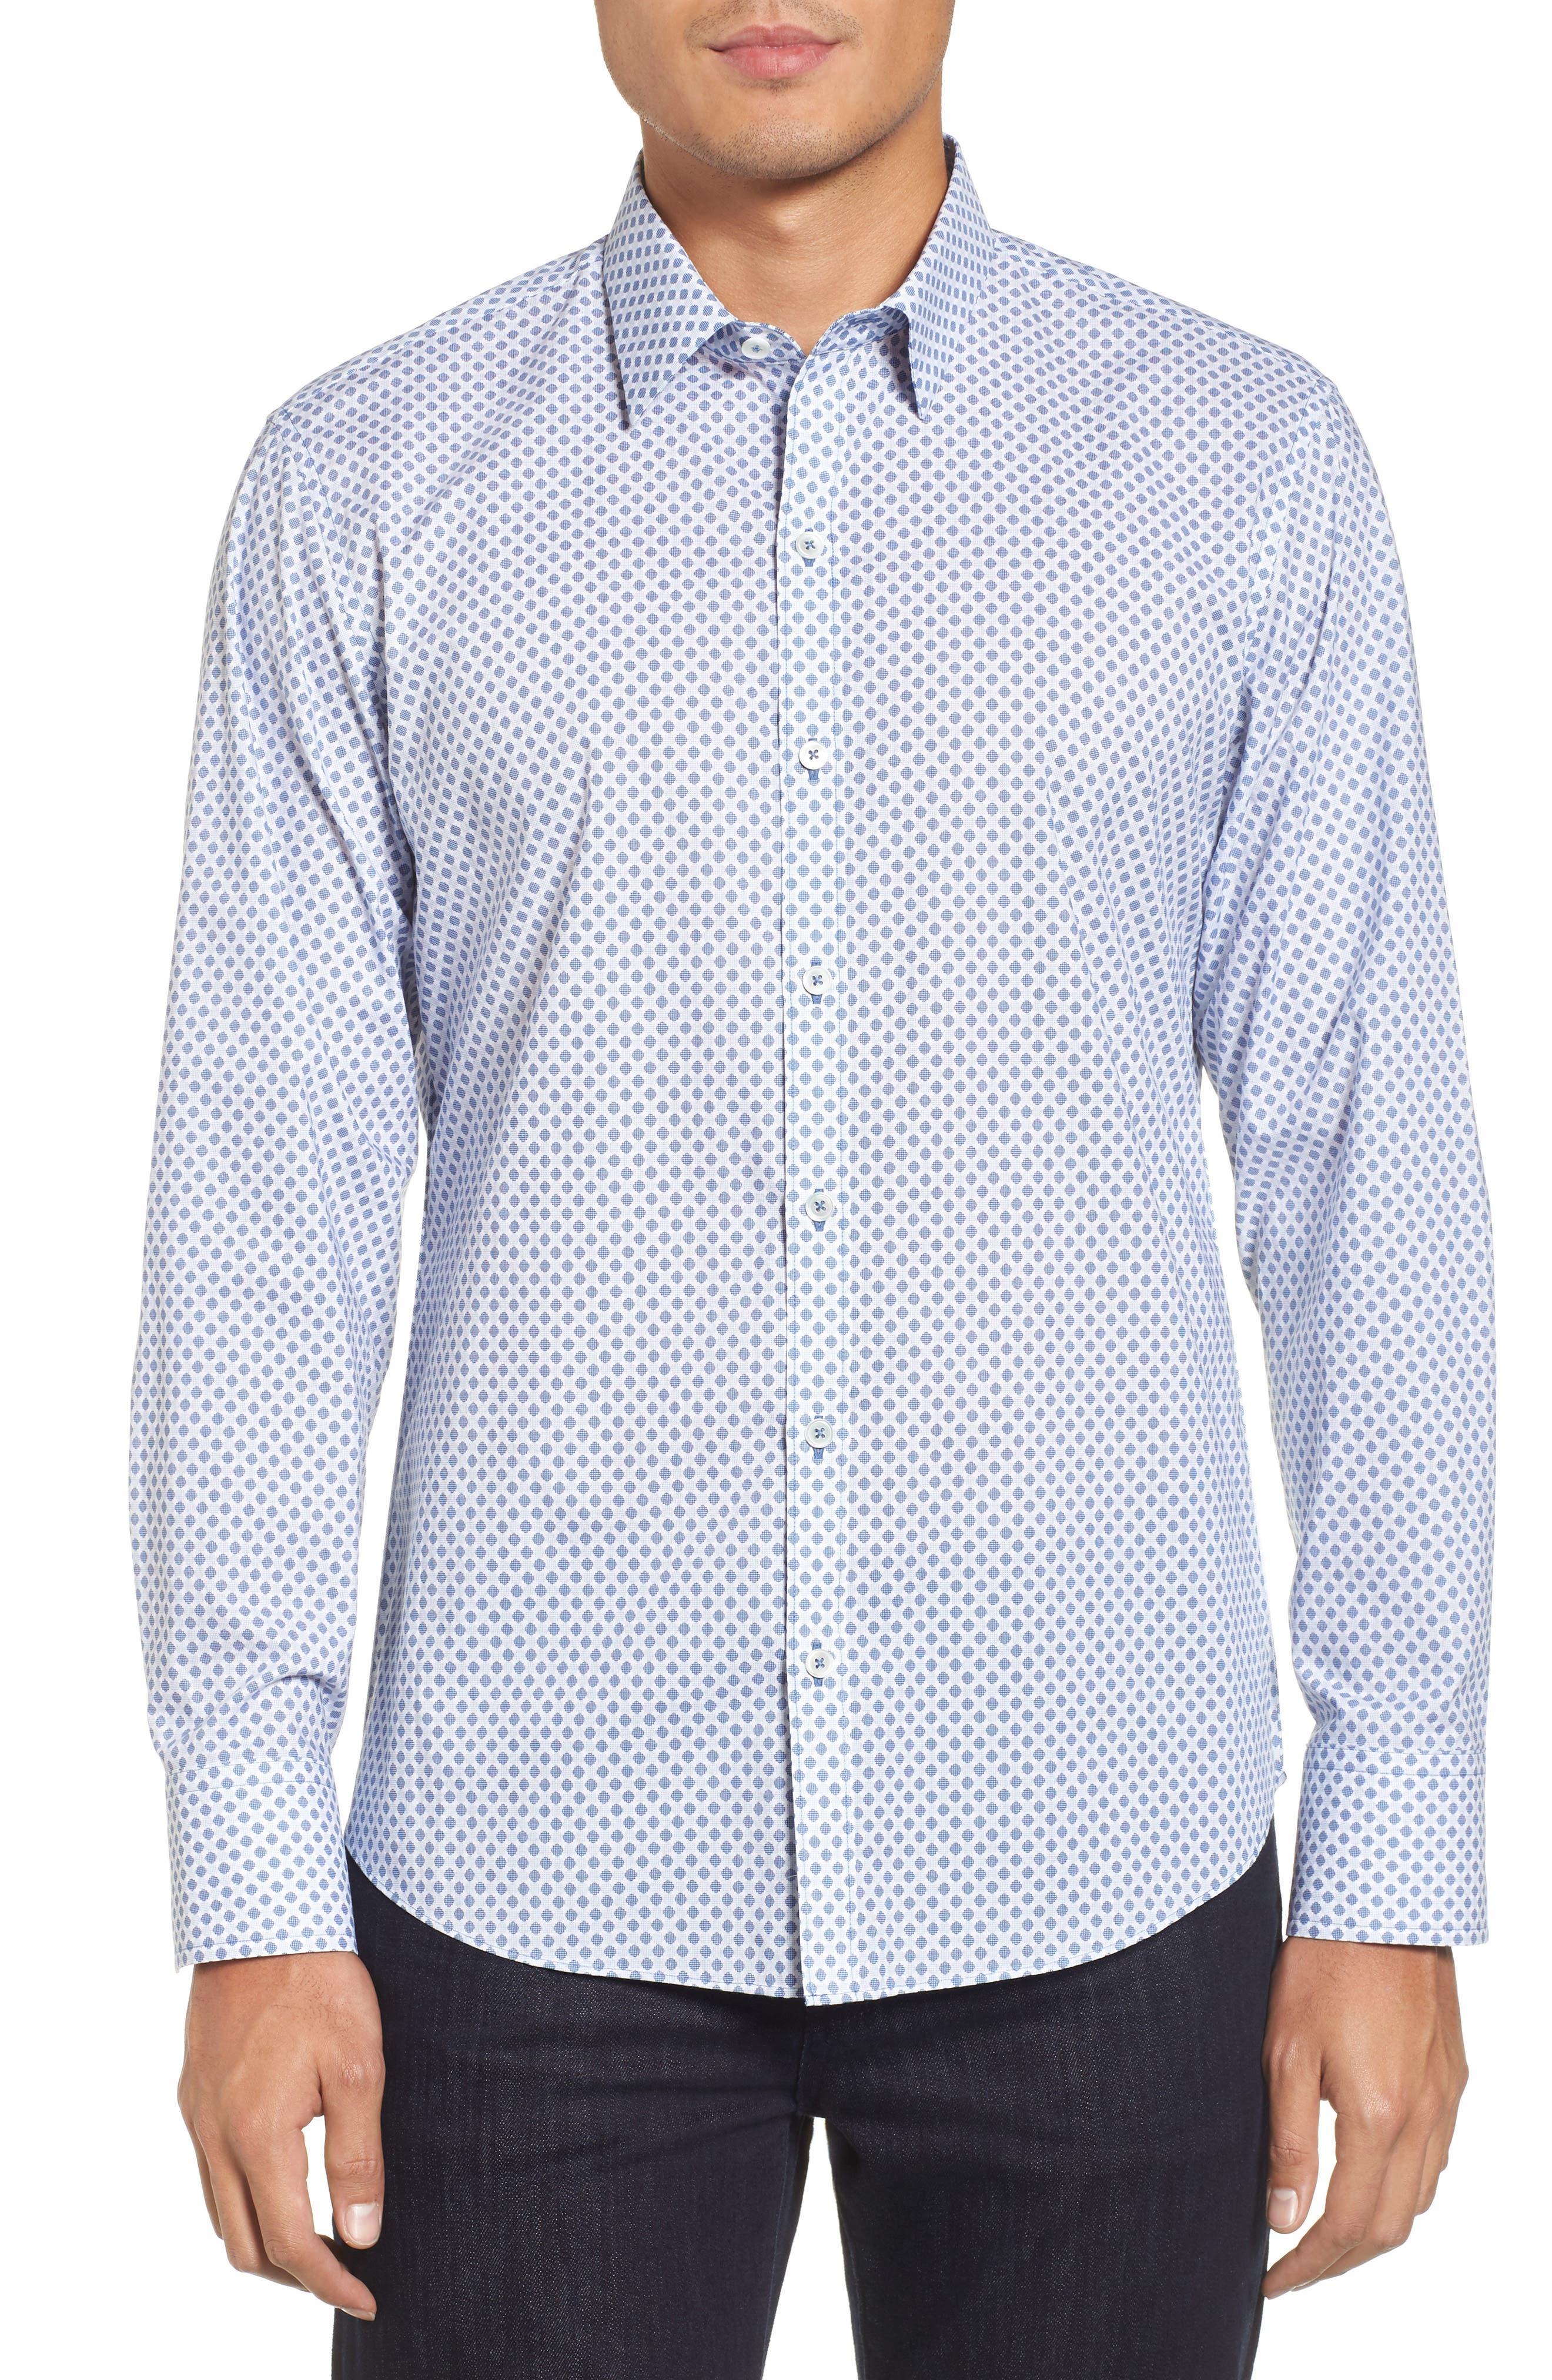 ZACHARY PRELL Obi Slim Fit Circle Print Sport Shirt in Navy